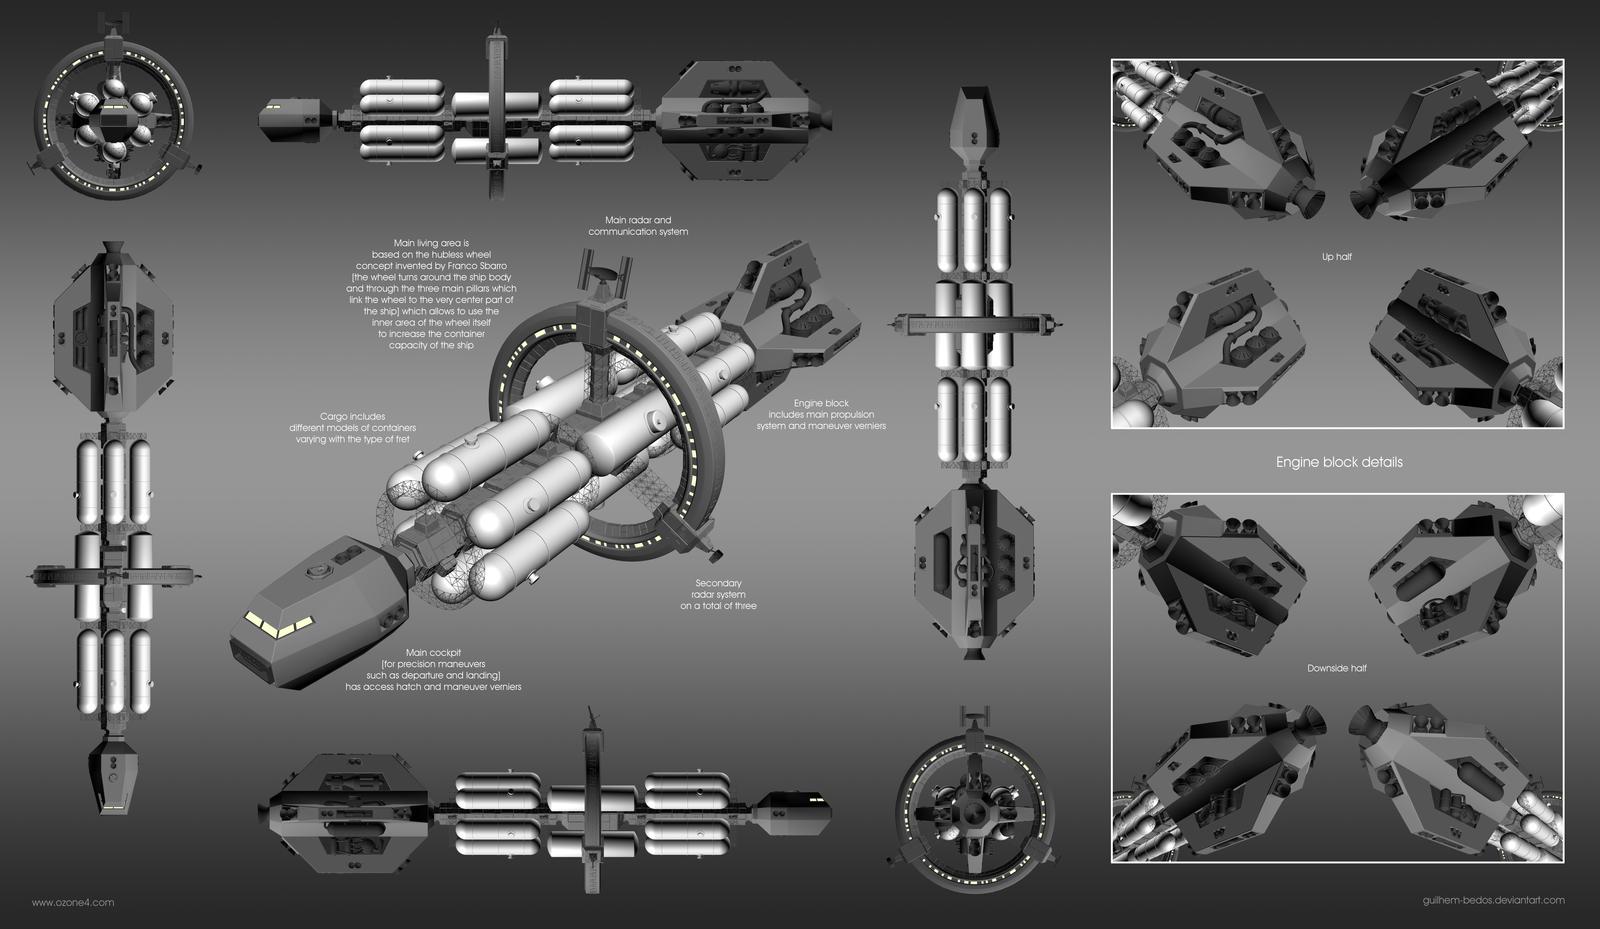 [WIP] Light Space Tanker by Guilhem-Bedos